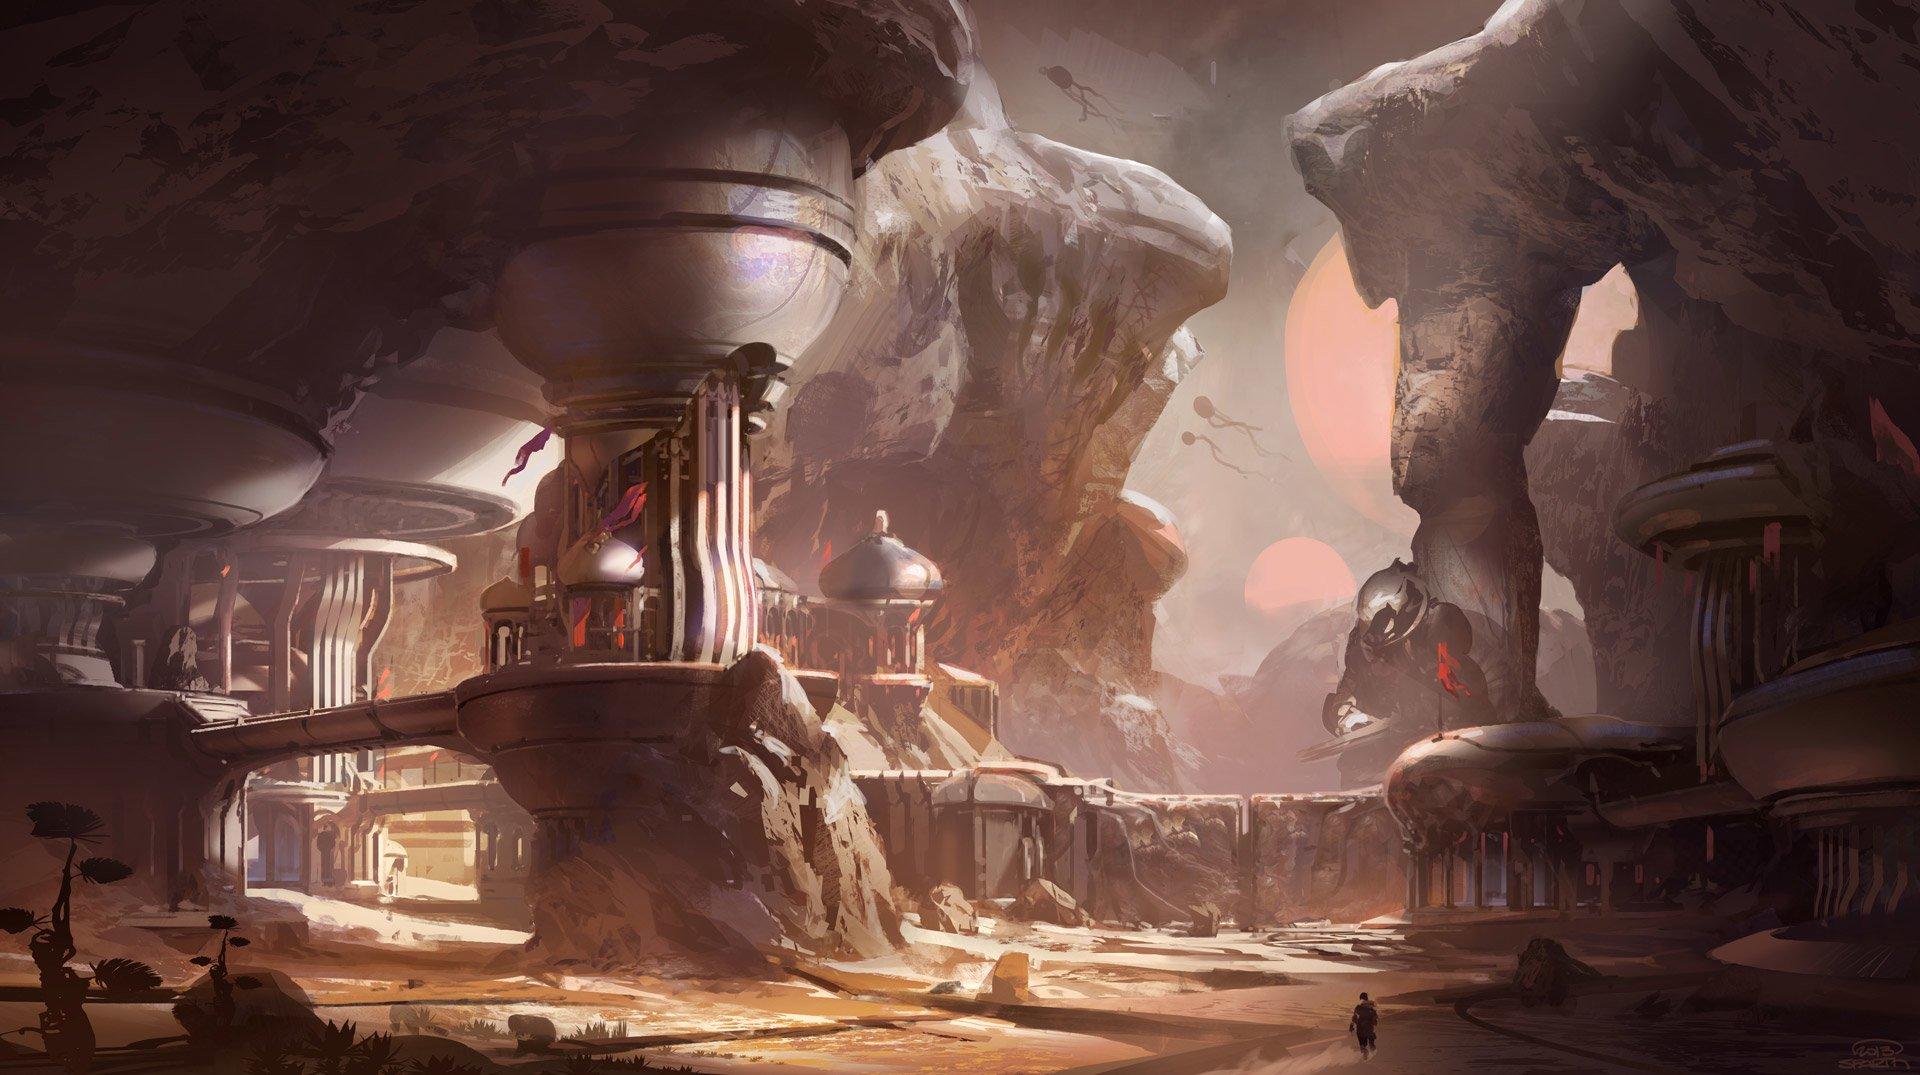 电子游戏 - 光晕5:守护者  Halo 5 光晕 Master Chief 壁纸